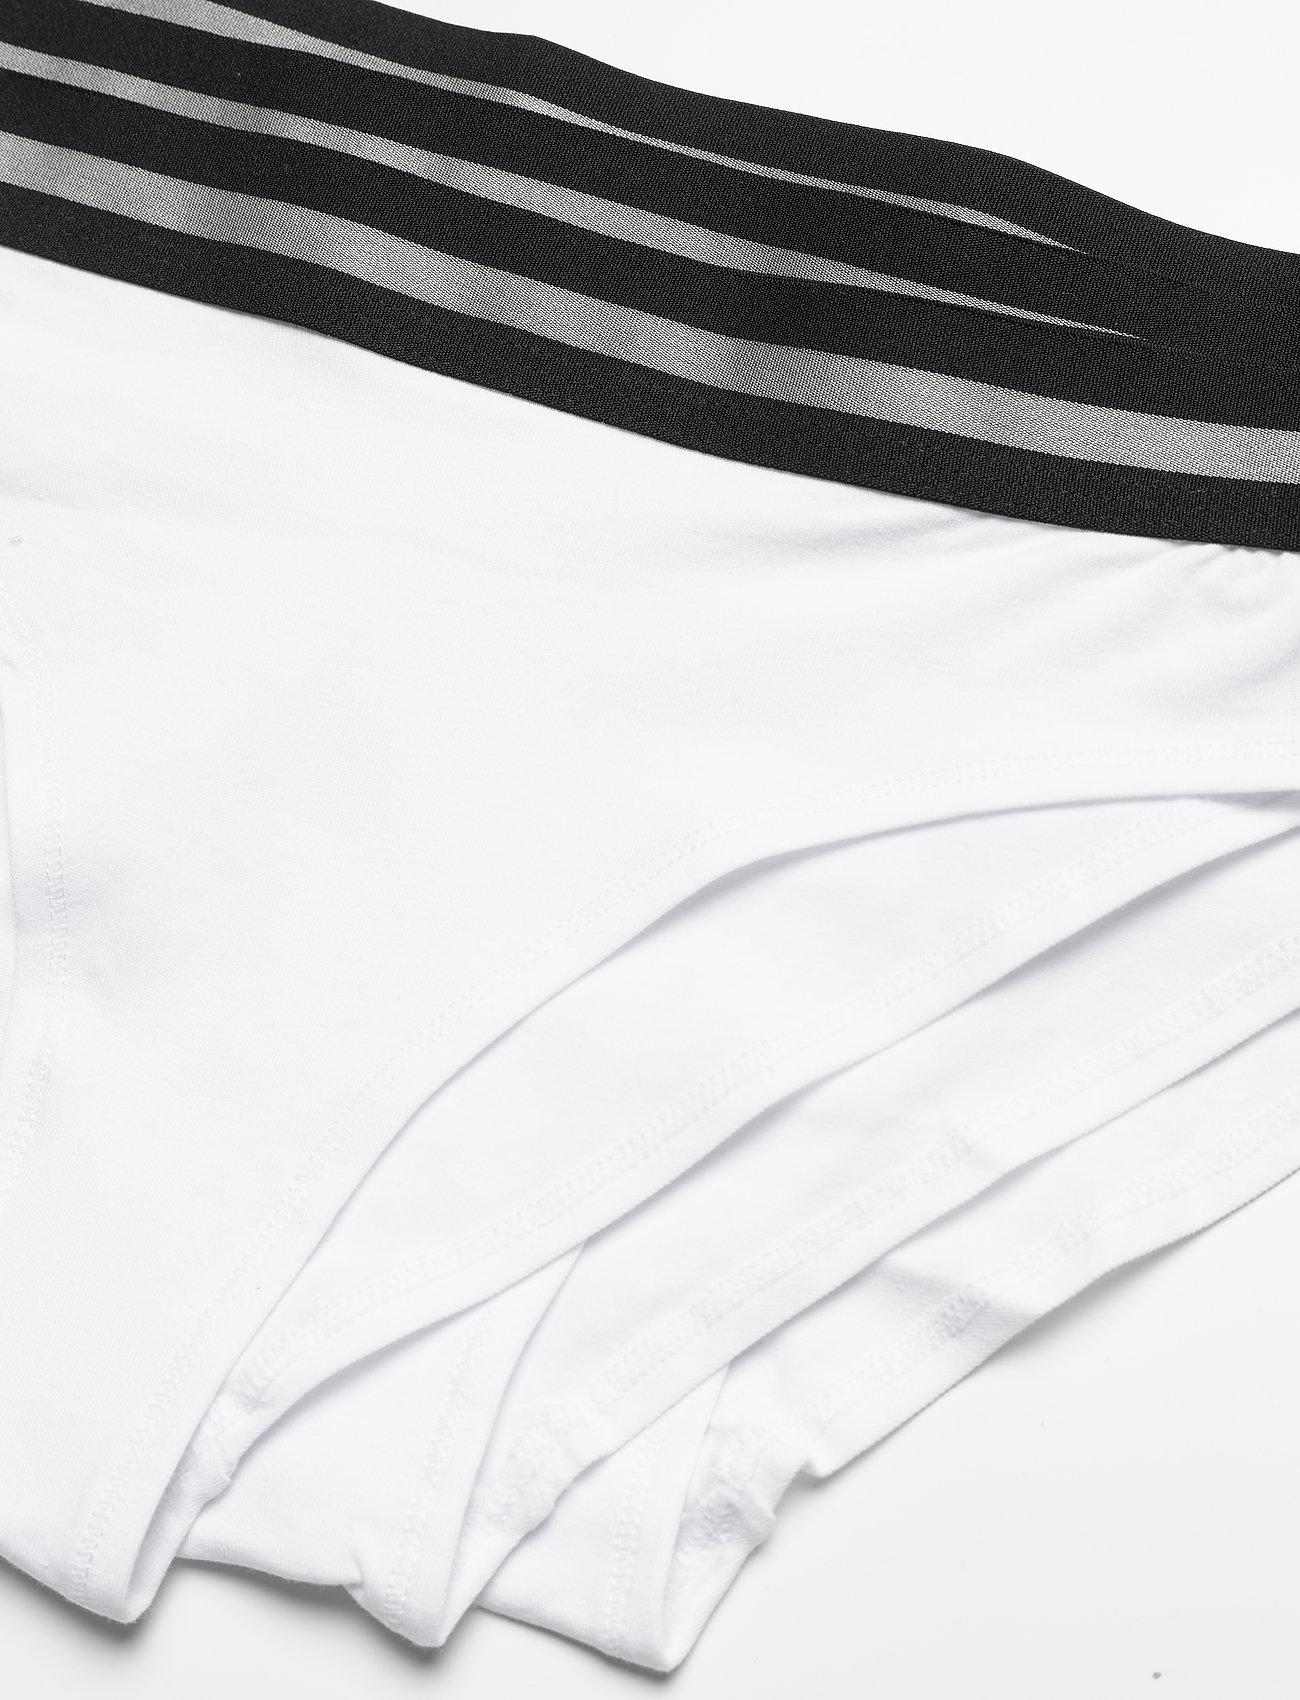 Danish Endurance - Organic Cotton Bikini Briefs by Pernille Blume 3 Pack - slips - white - 1